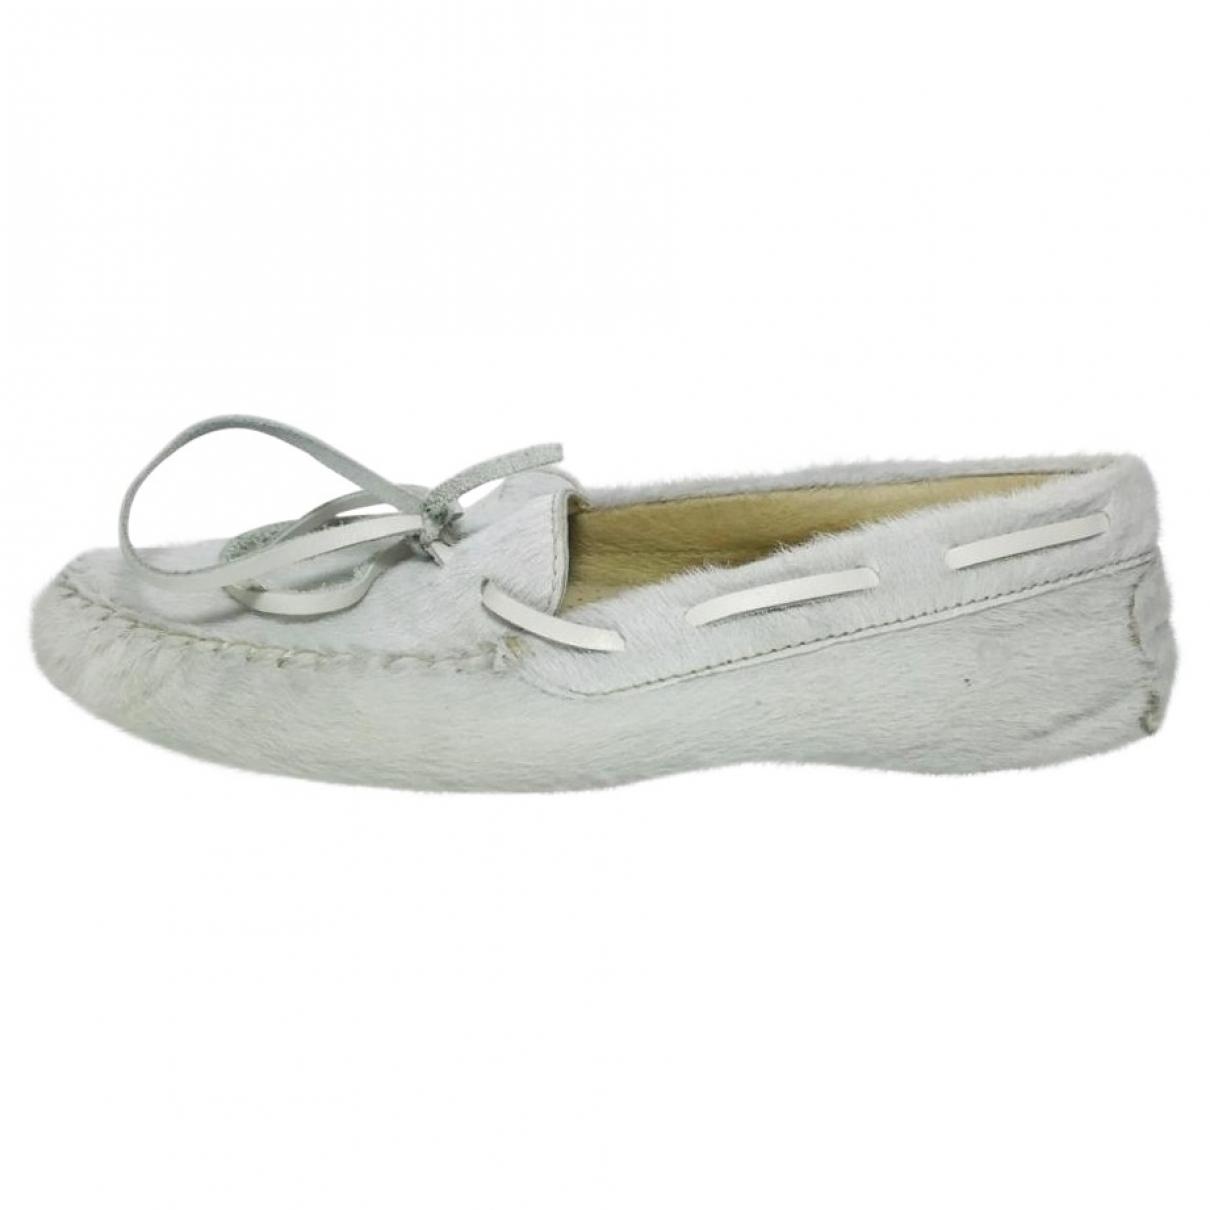 Penelope Chilvers \N Grey Pony-style calfskin Flats for Women 36 EU